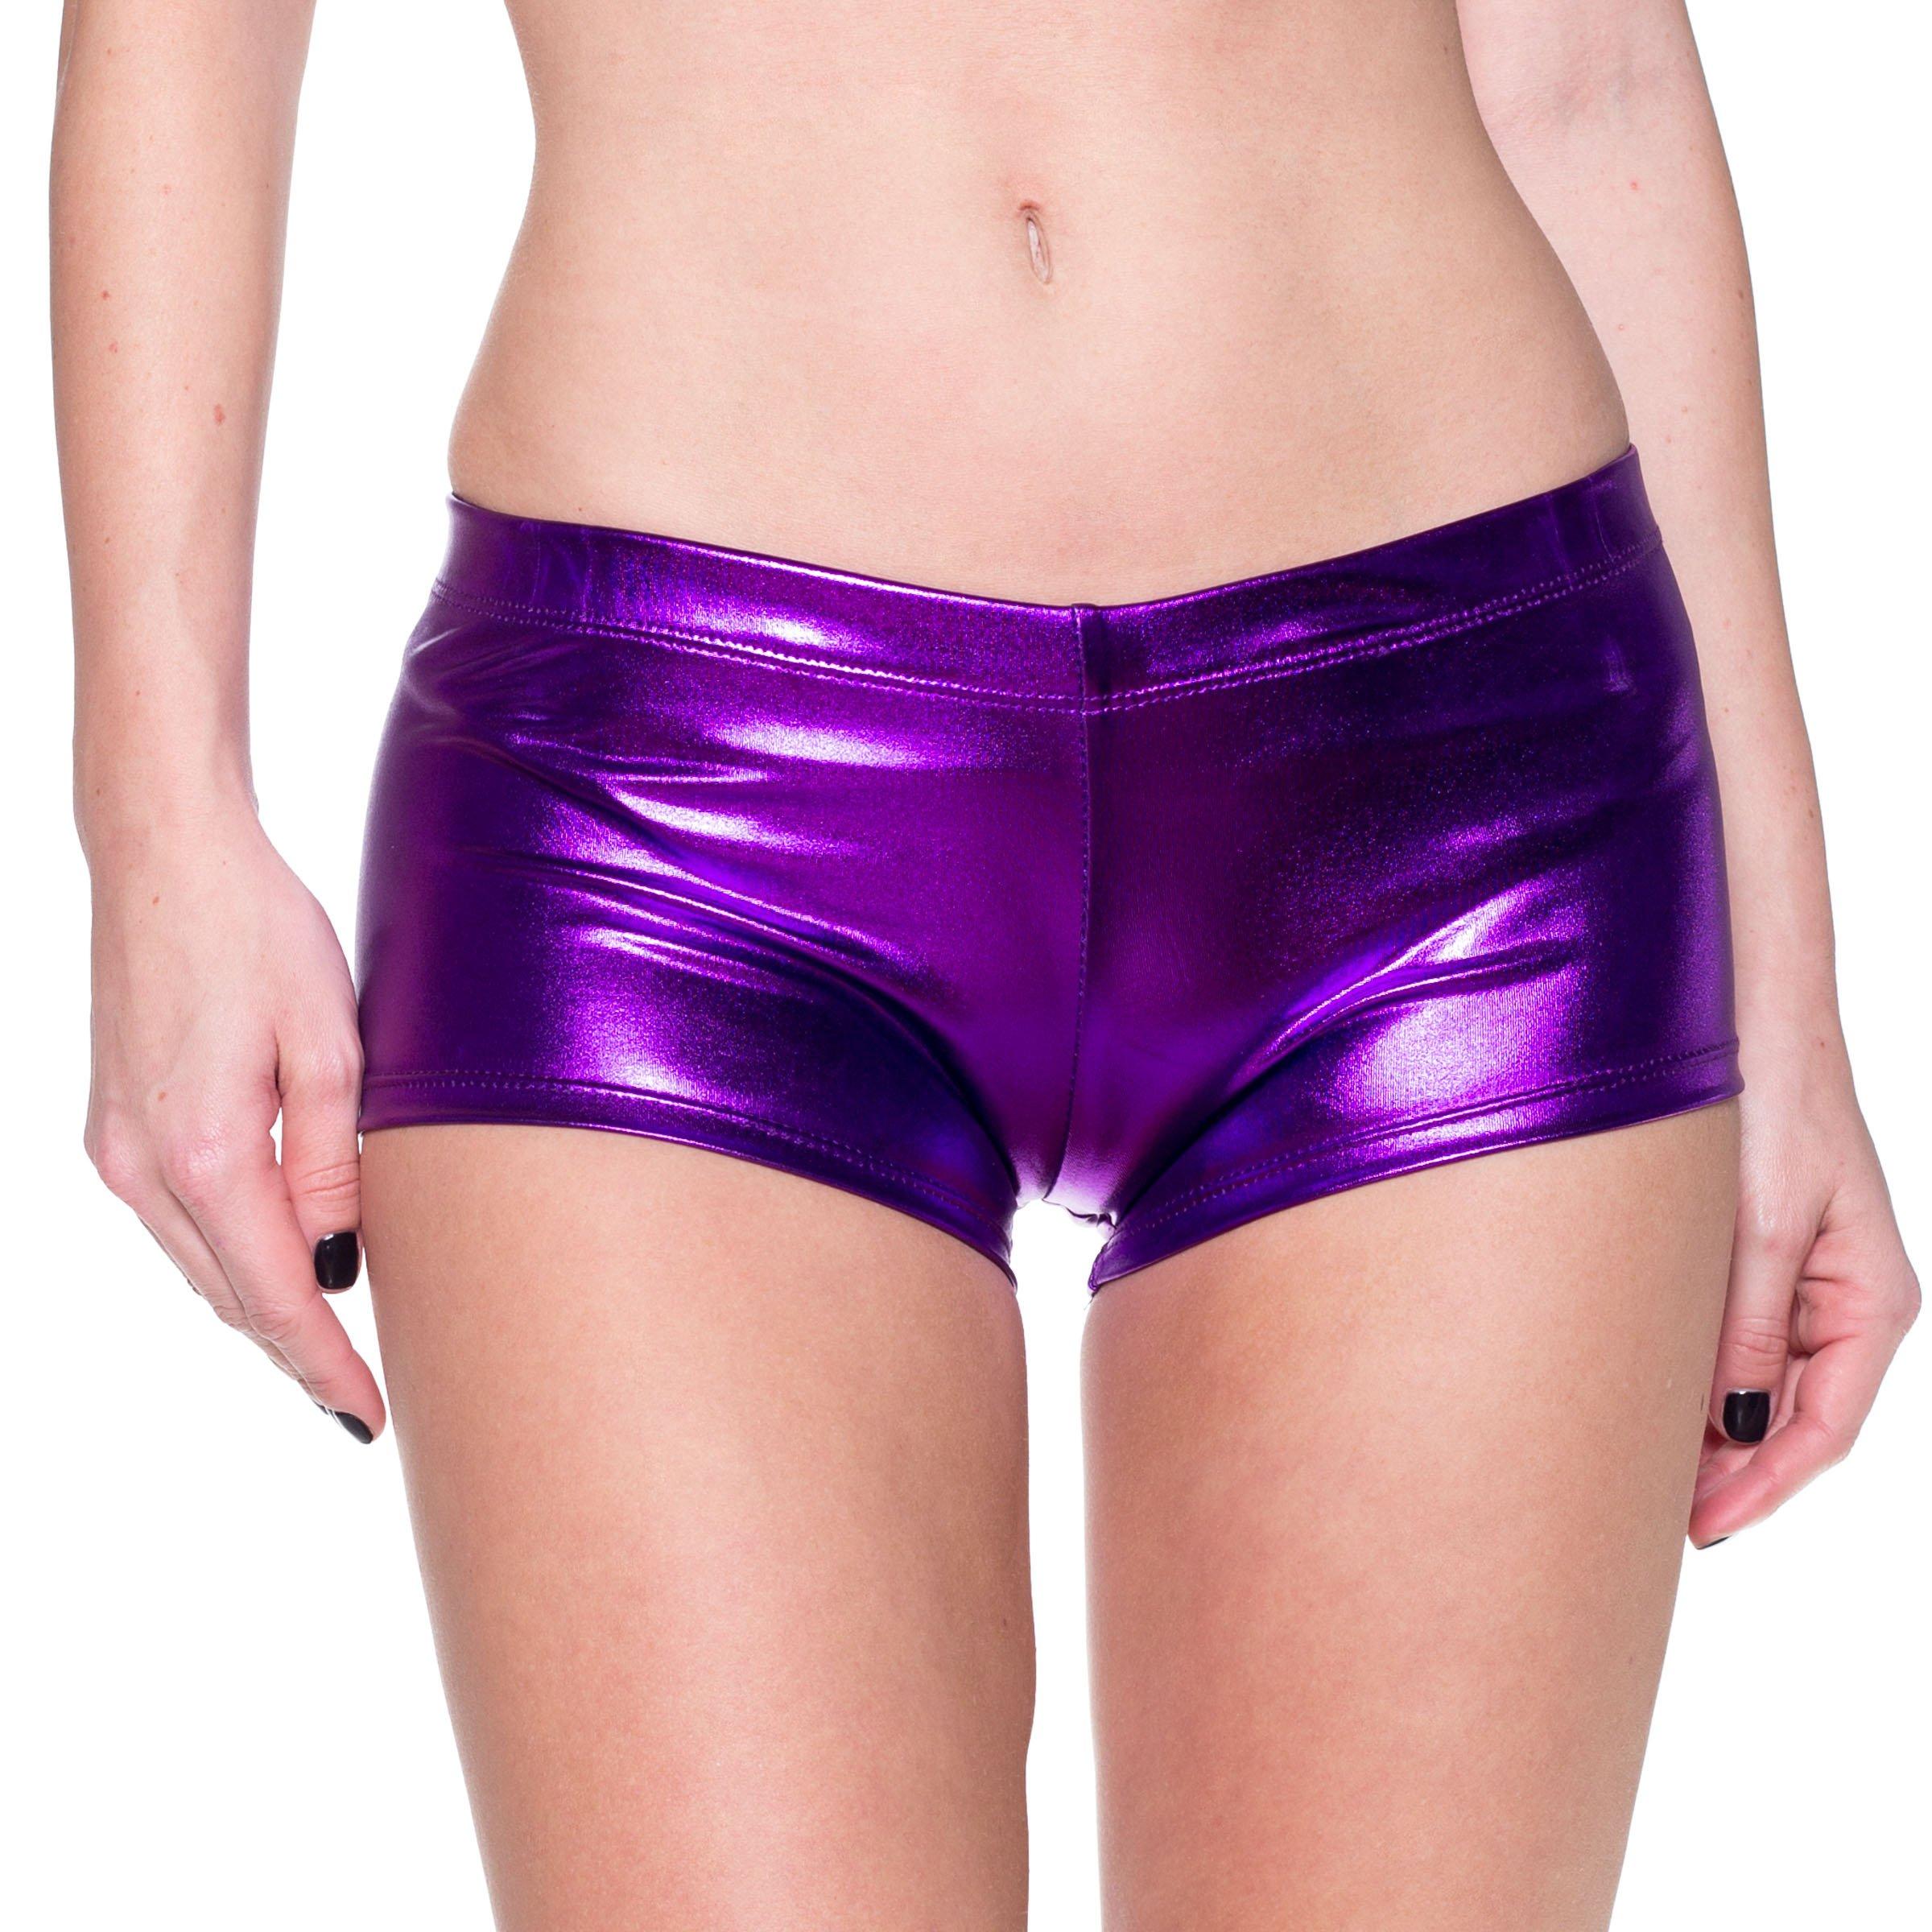 J2 Love Women's Metallic Booty Shorts, Small, Purple